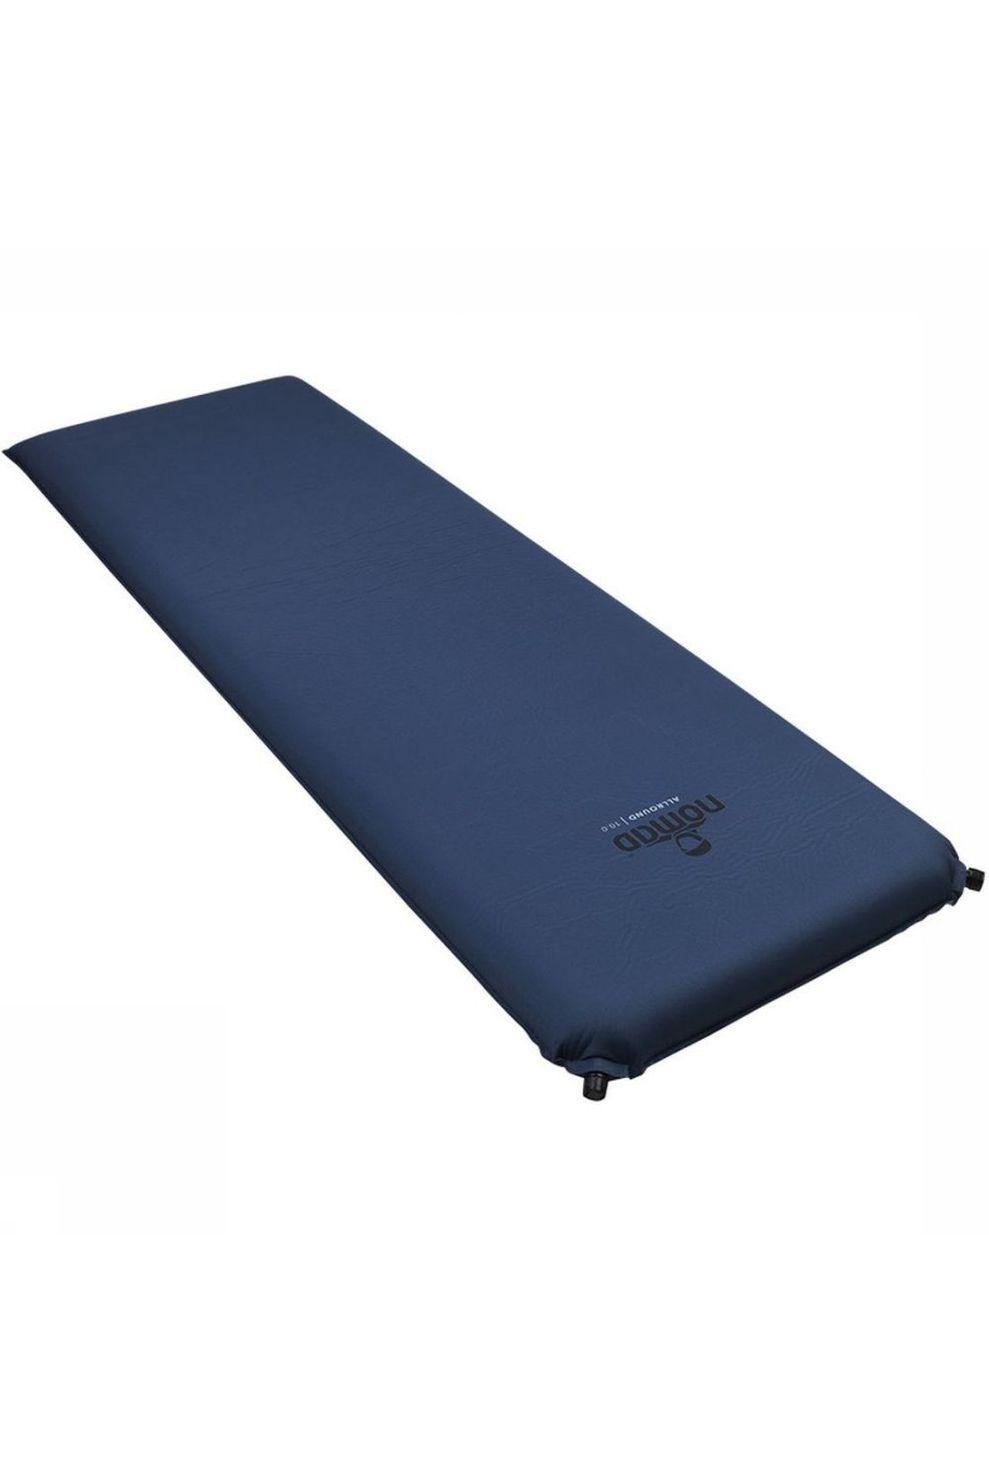 Nomad Slaapmat Allround 10.0 - Blauw